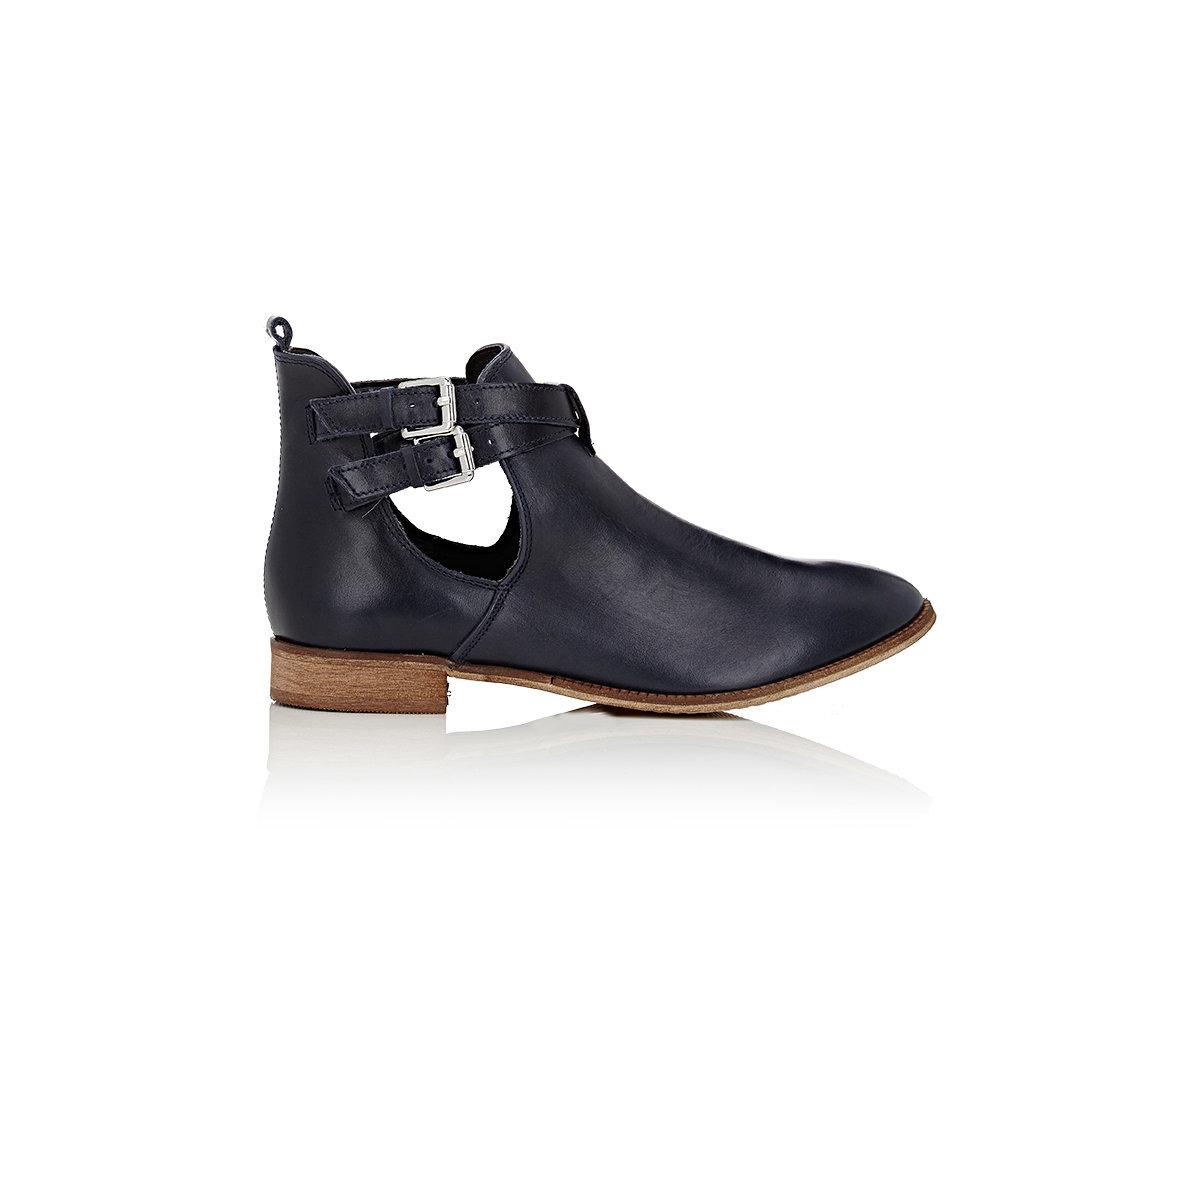 barneys new york crisscross ankle boots in black lyst